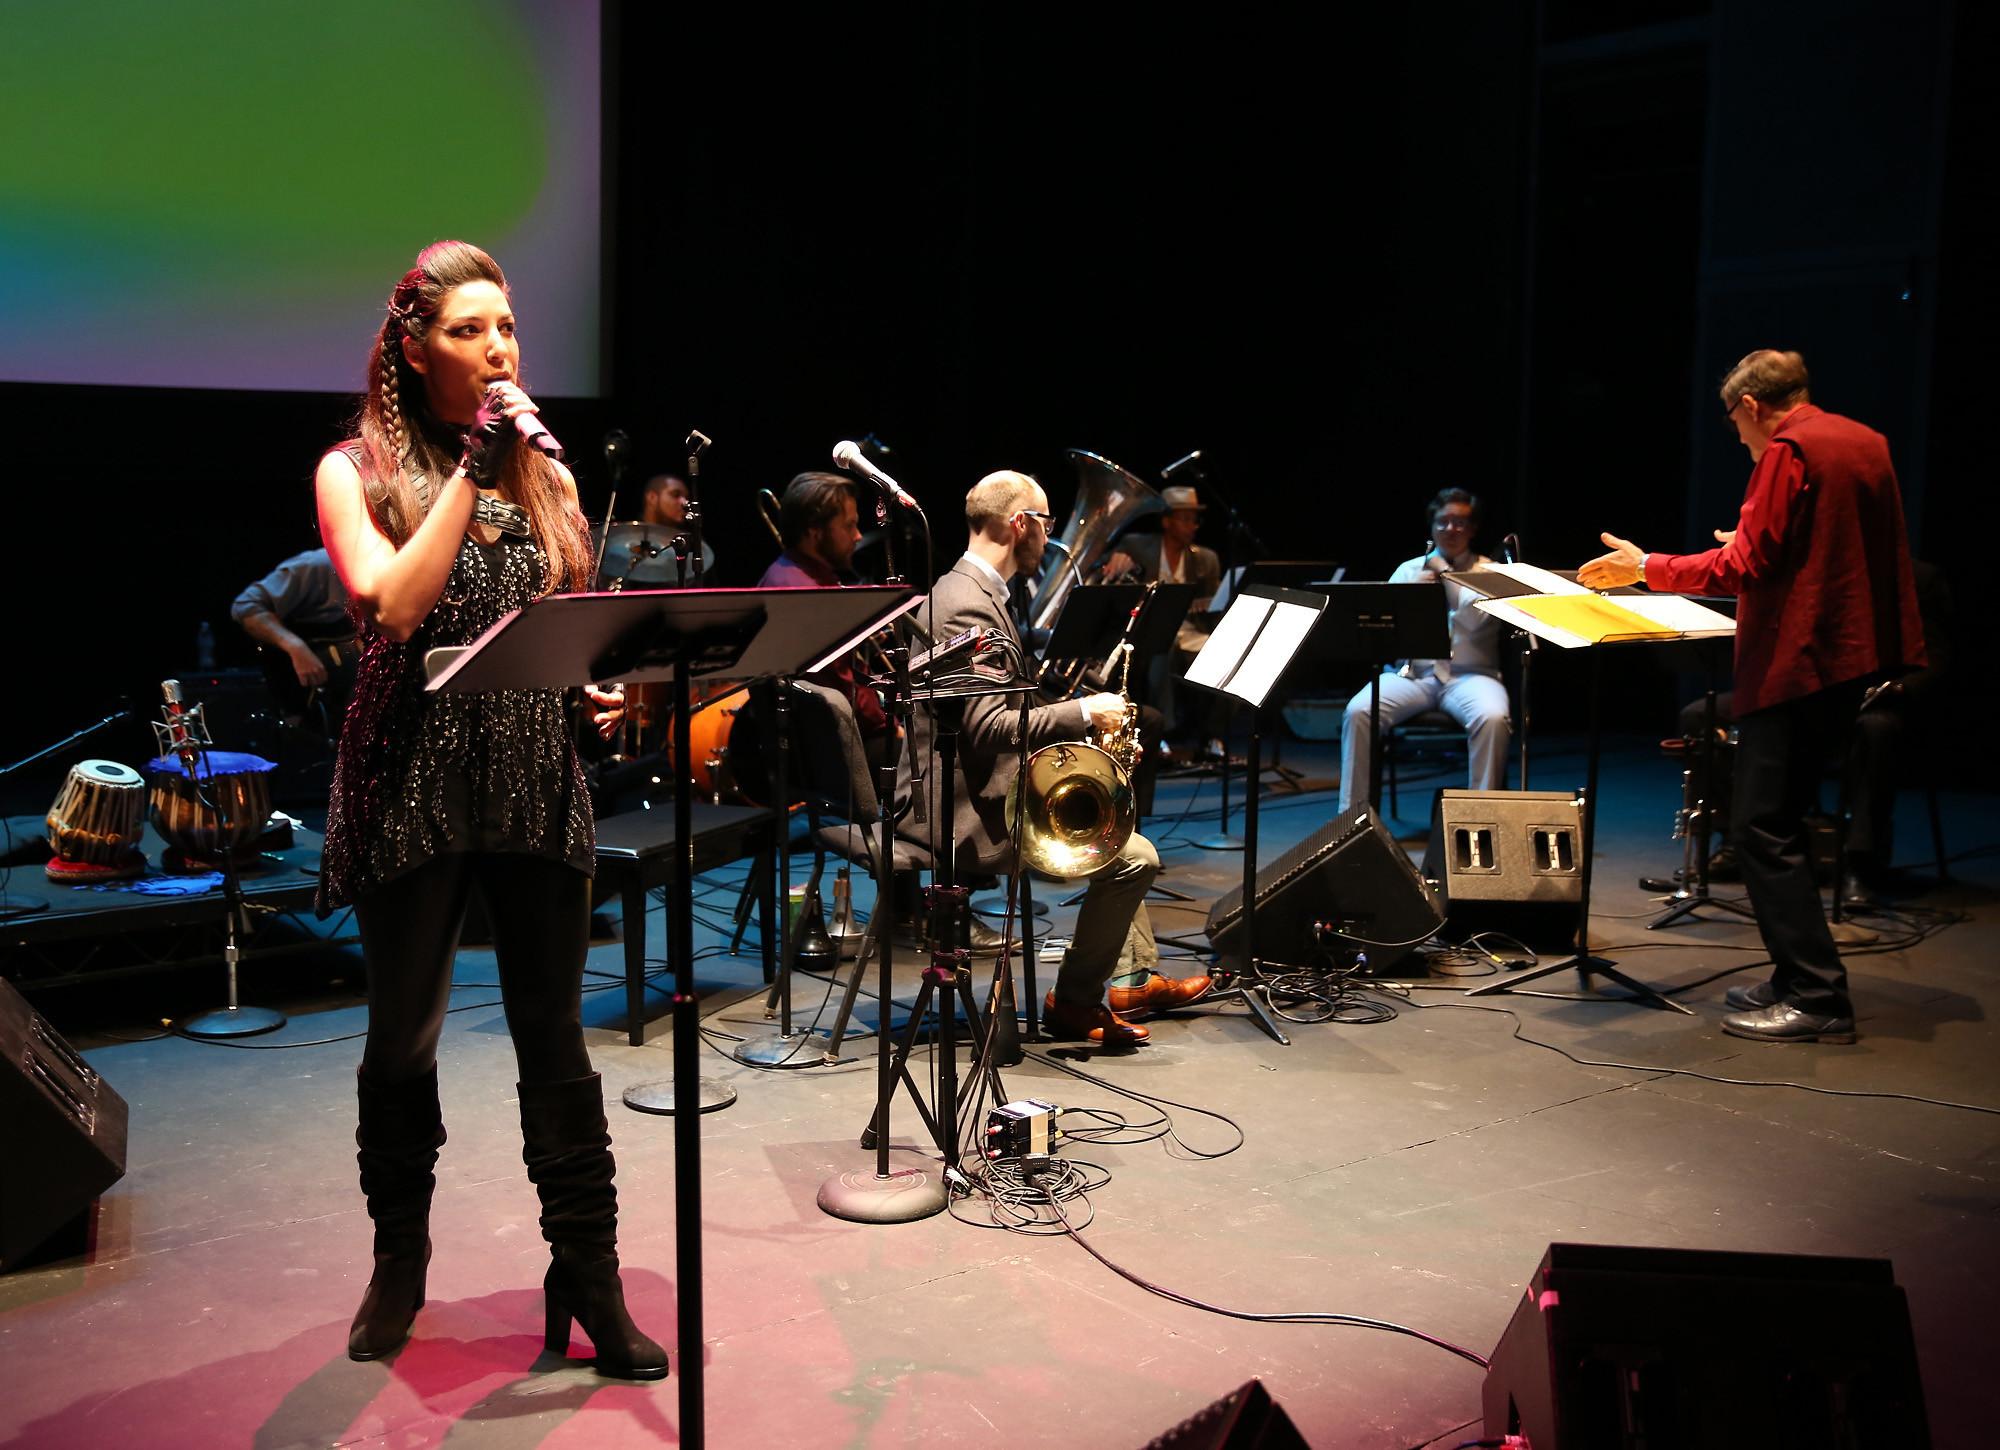 The multimedia concert